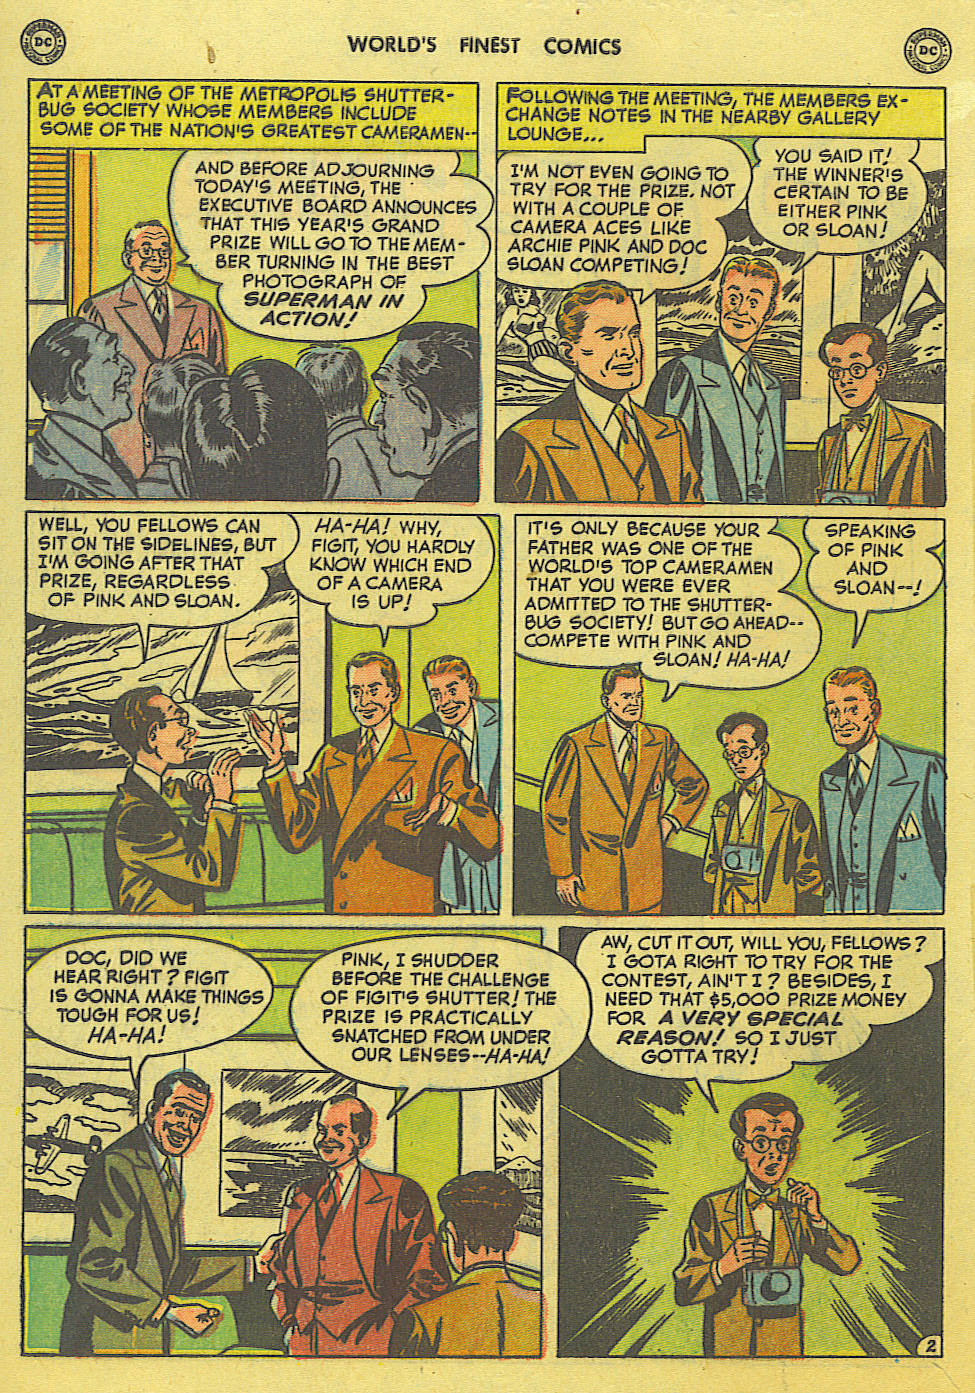 Read online World's Finest Comics comic -  Issue #49 - 4